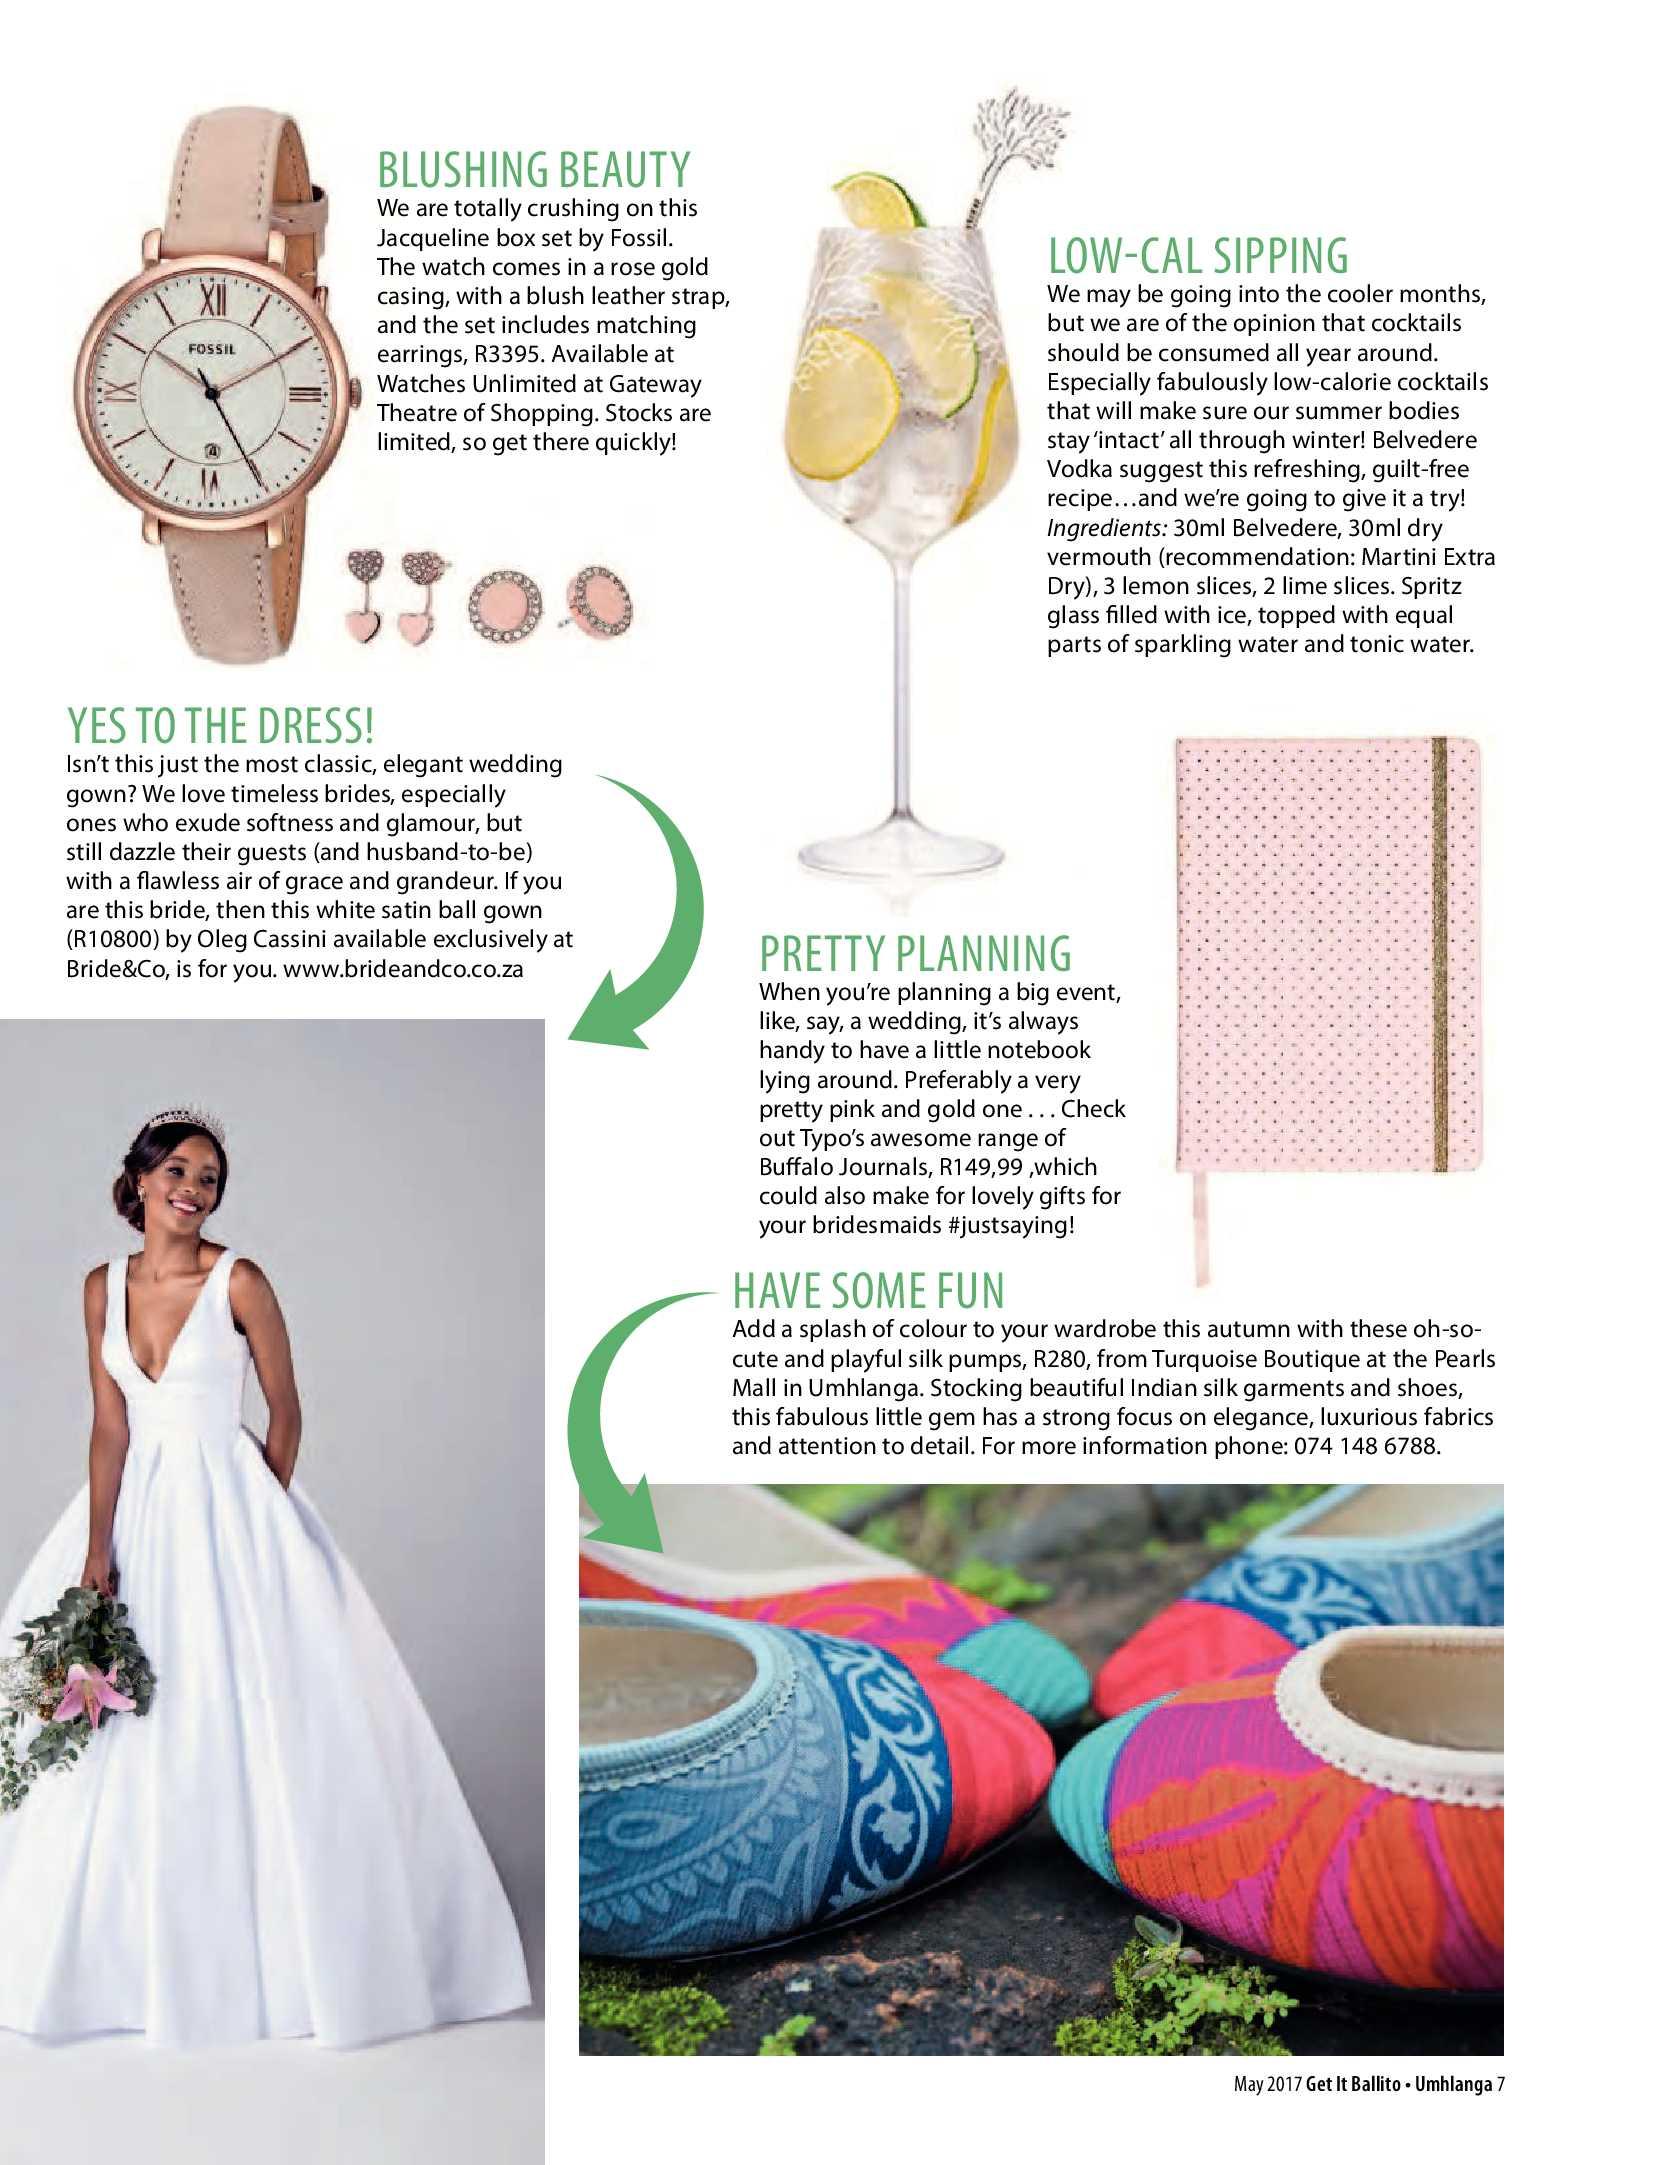 get-magazine-ballitoumhlanga-may-2017-epapers-page-9